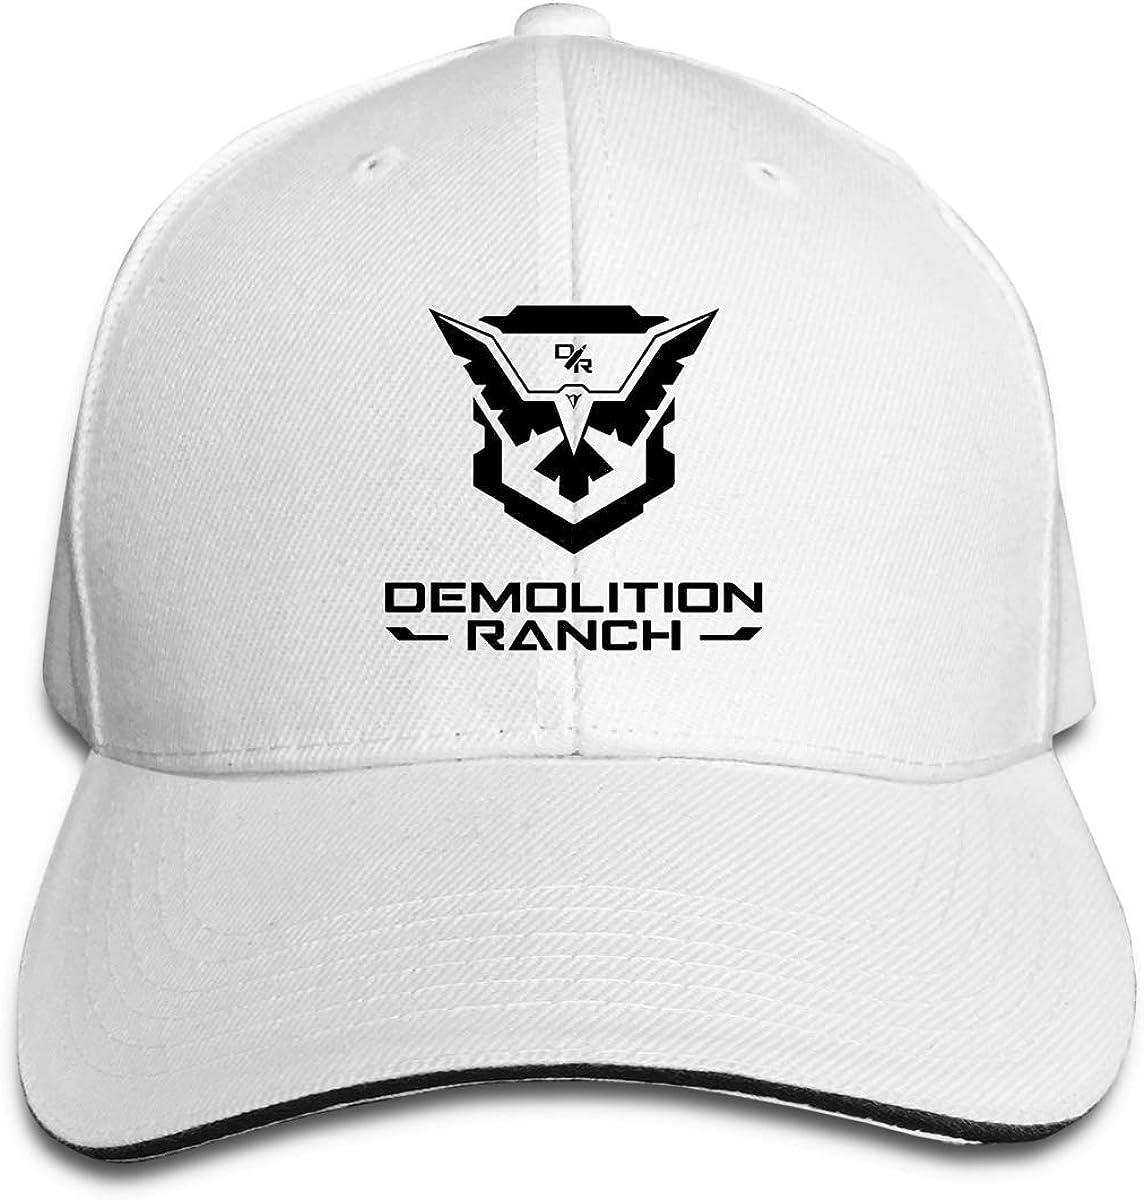 Demolition Ranch Caps Sports Trucker Caps Pattern Strapback Hat for Men//Women